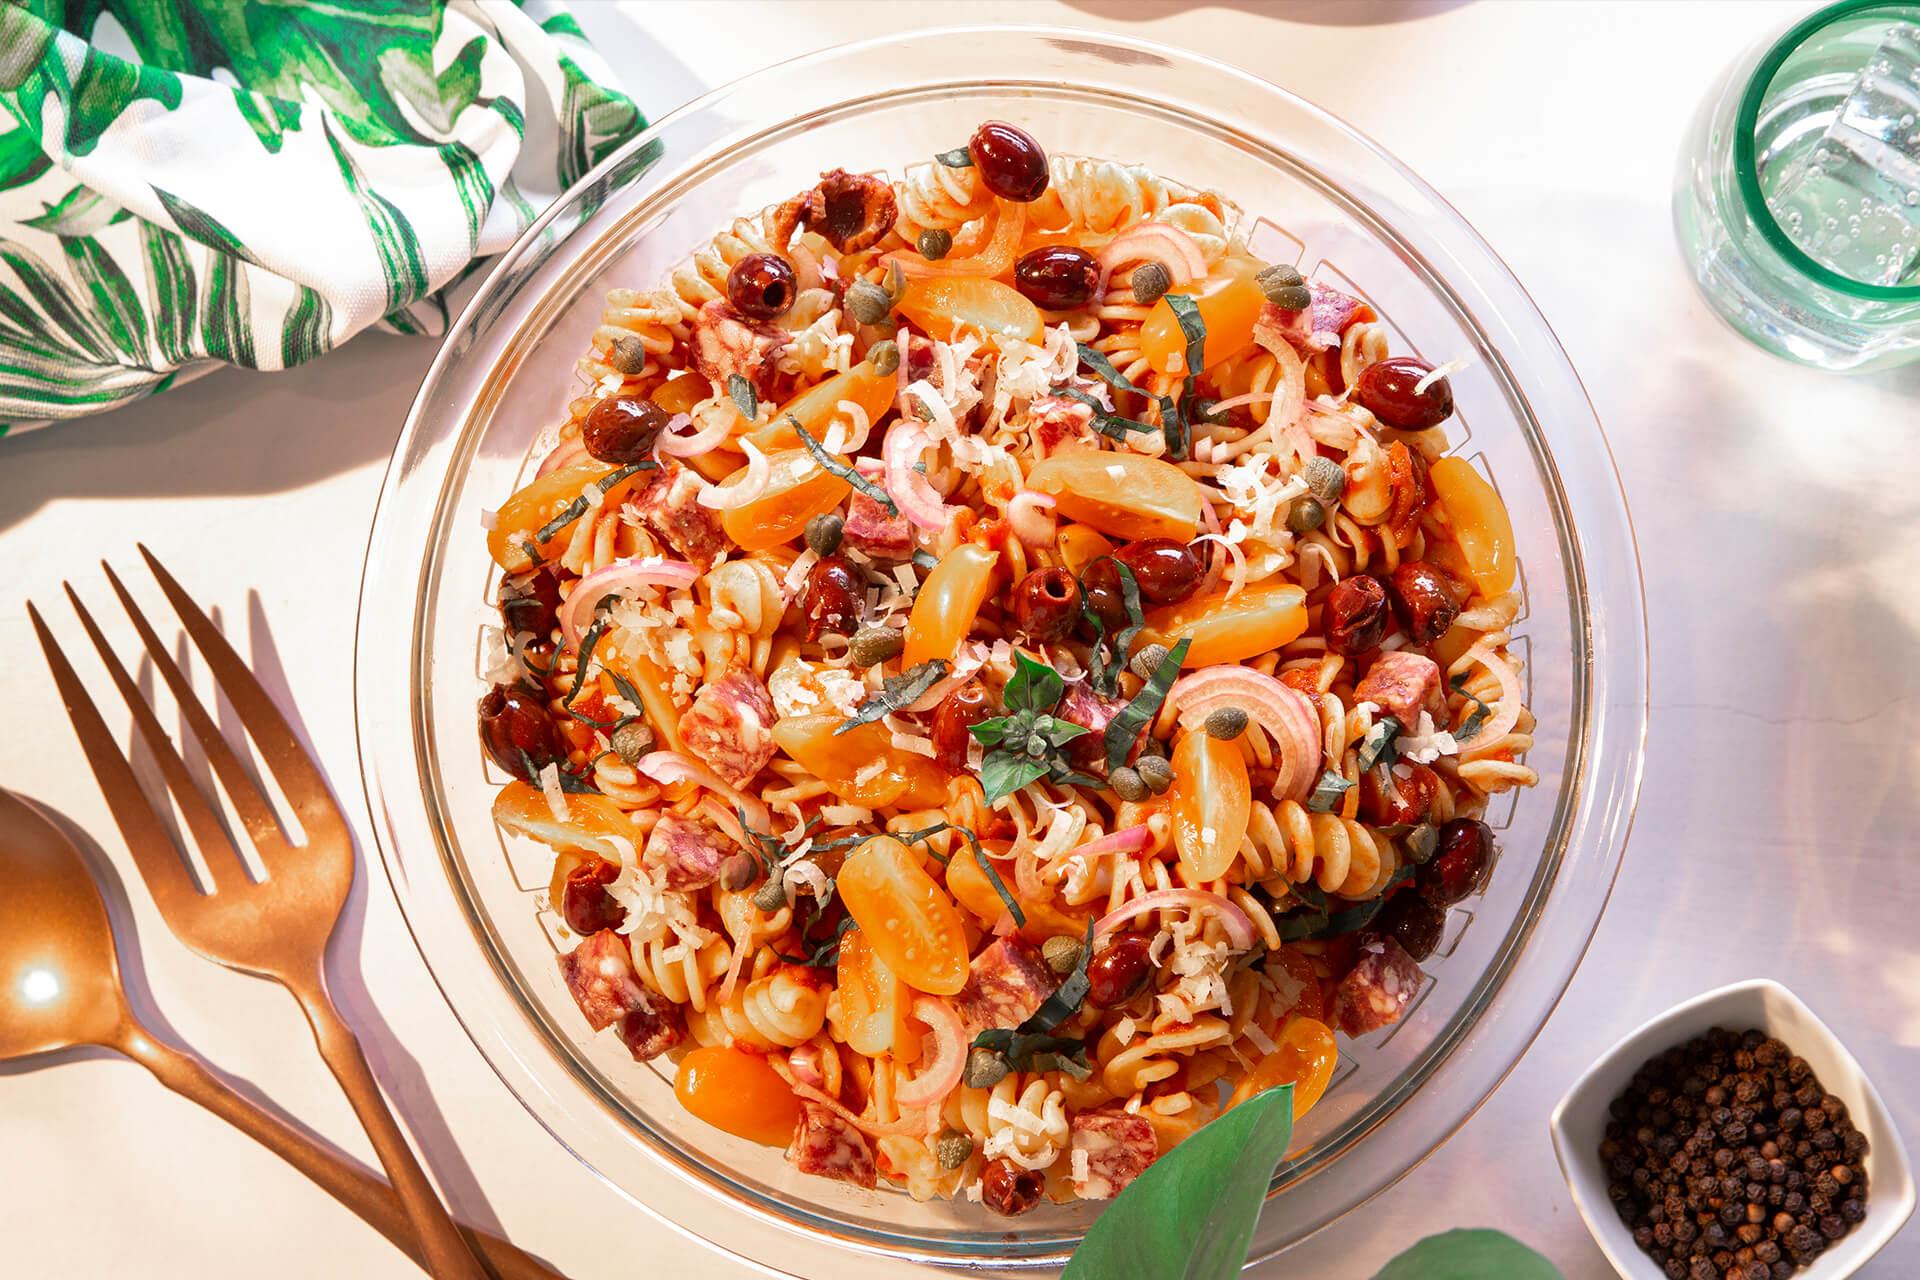 25-Minute Puttanesca Pasta Salad